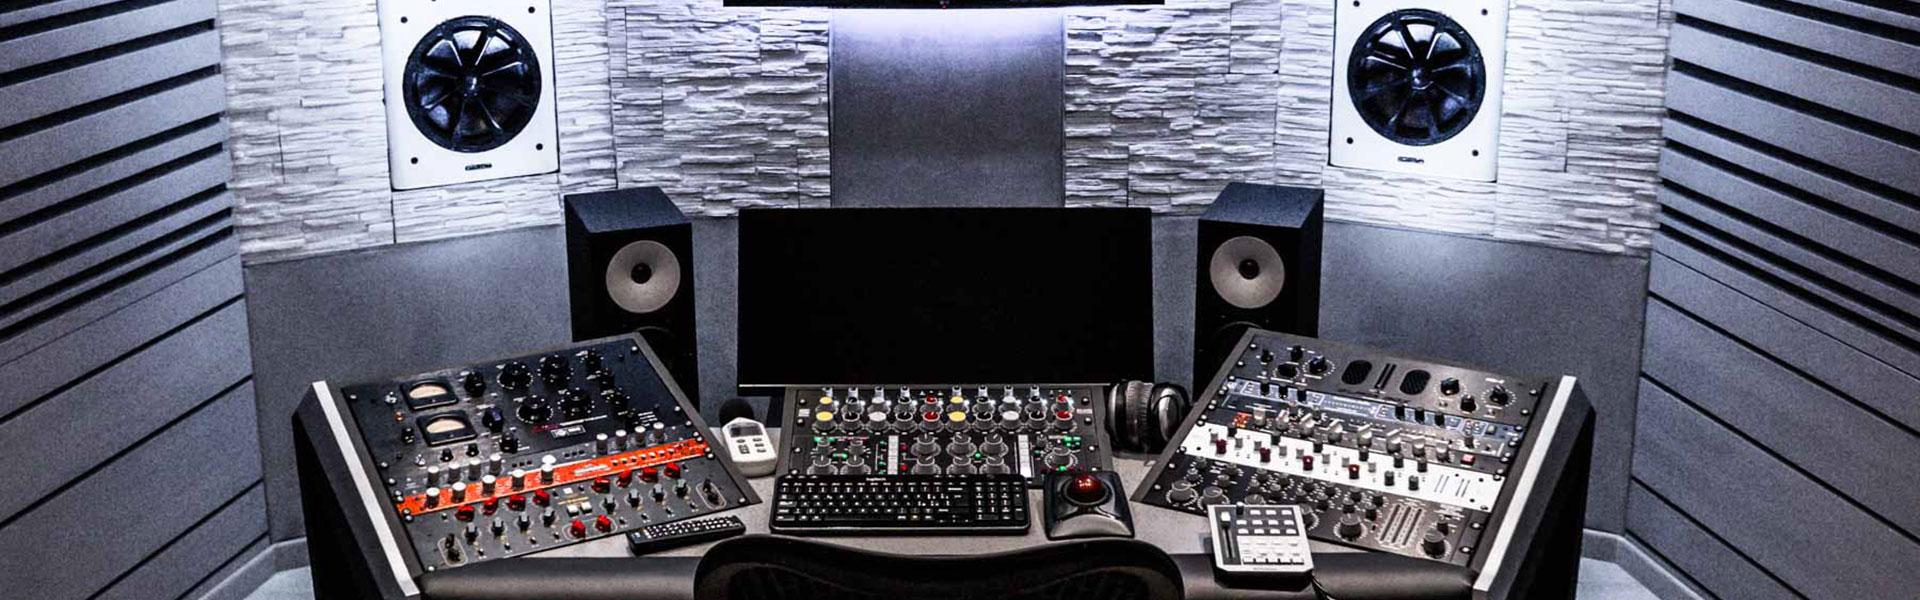 Studio-macchine